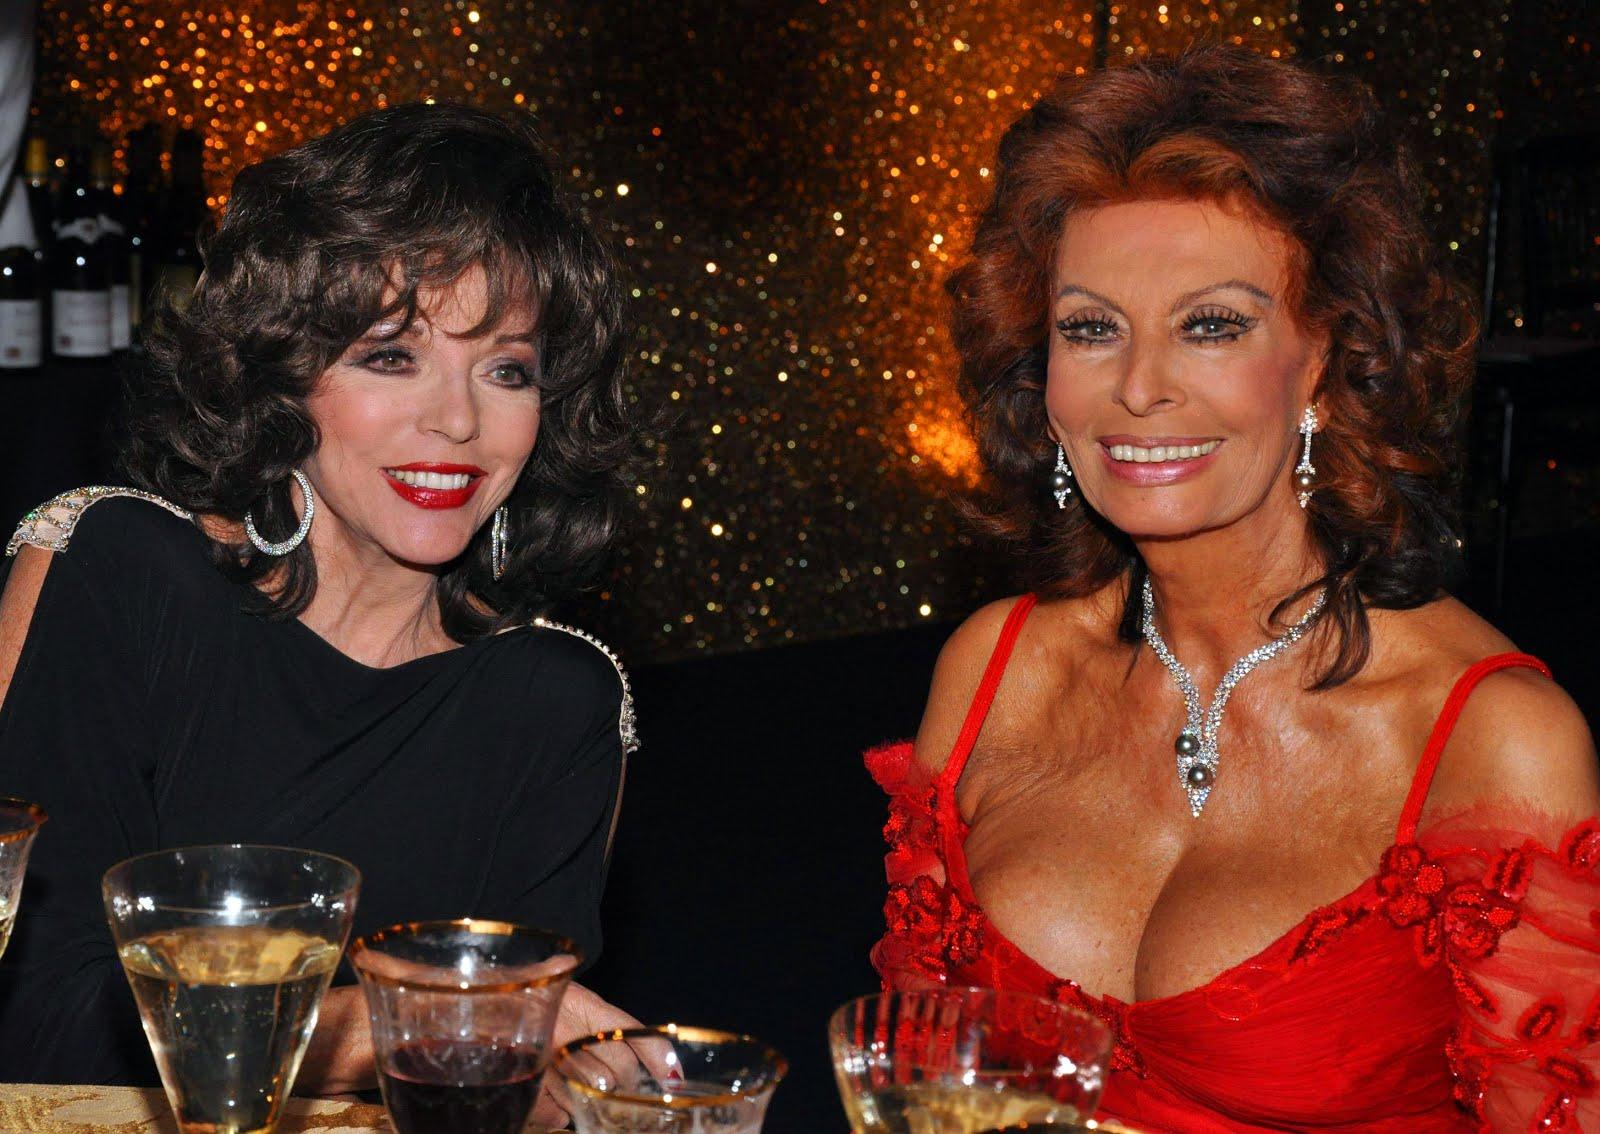 http://1.bp.blogspot.com/-rvoBl4KgEKo/UJh6sr6cChI/AAAAAAAASyQ/jusEKz9Wee0/s1600/Joan-Collins-and-Sophia-Loren.jpg